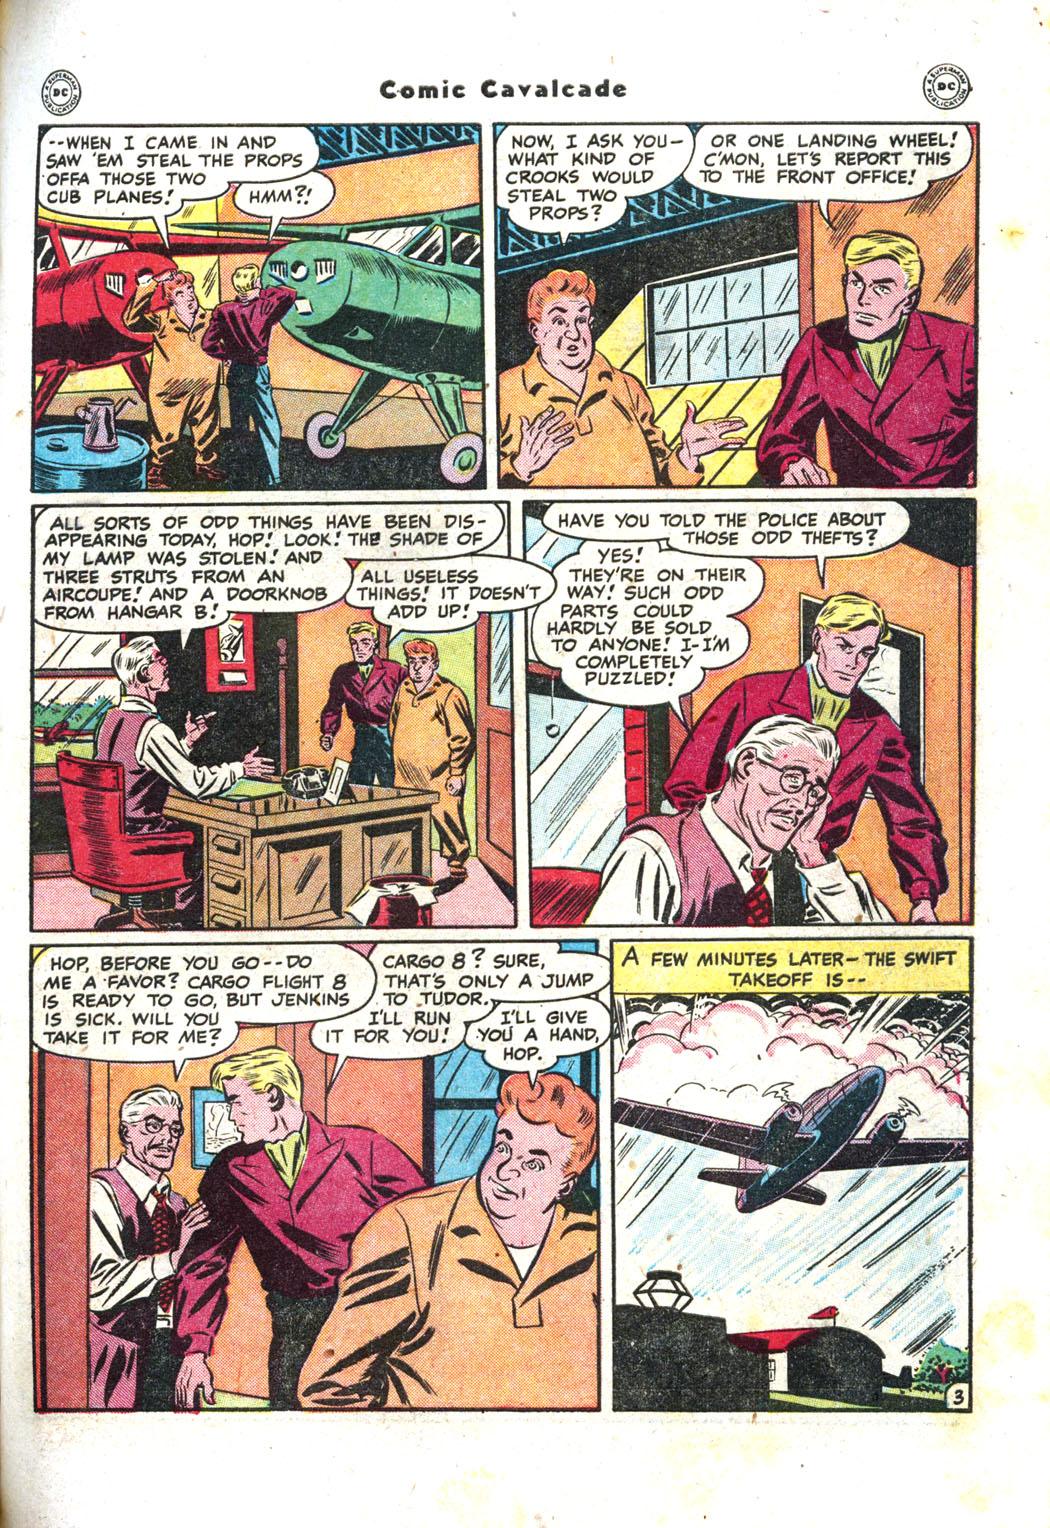 Comic Cavalcade issue 26 - Page 51